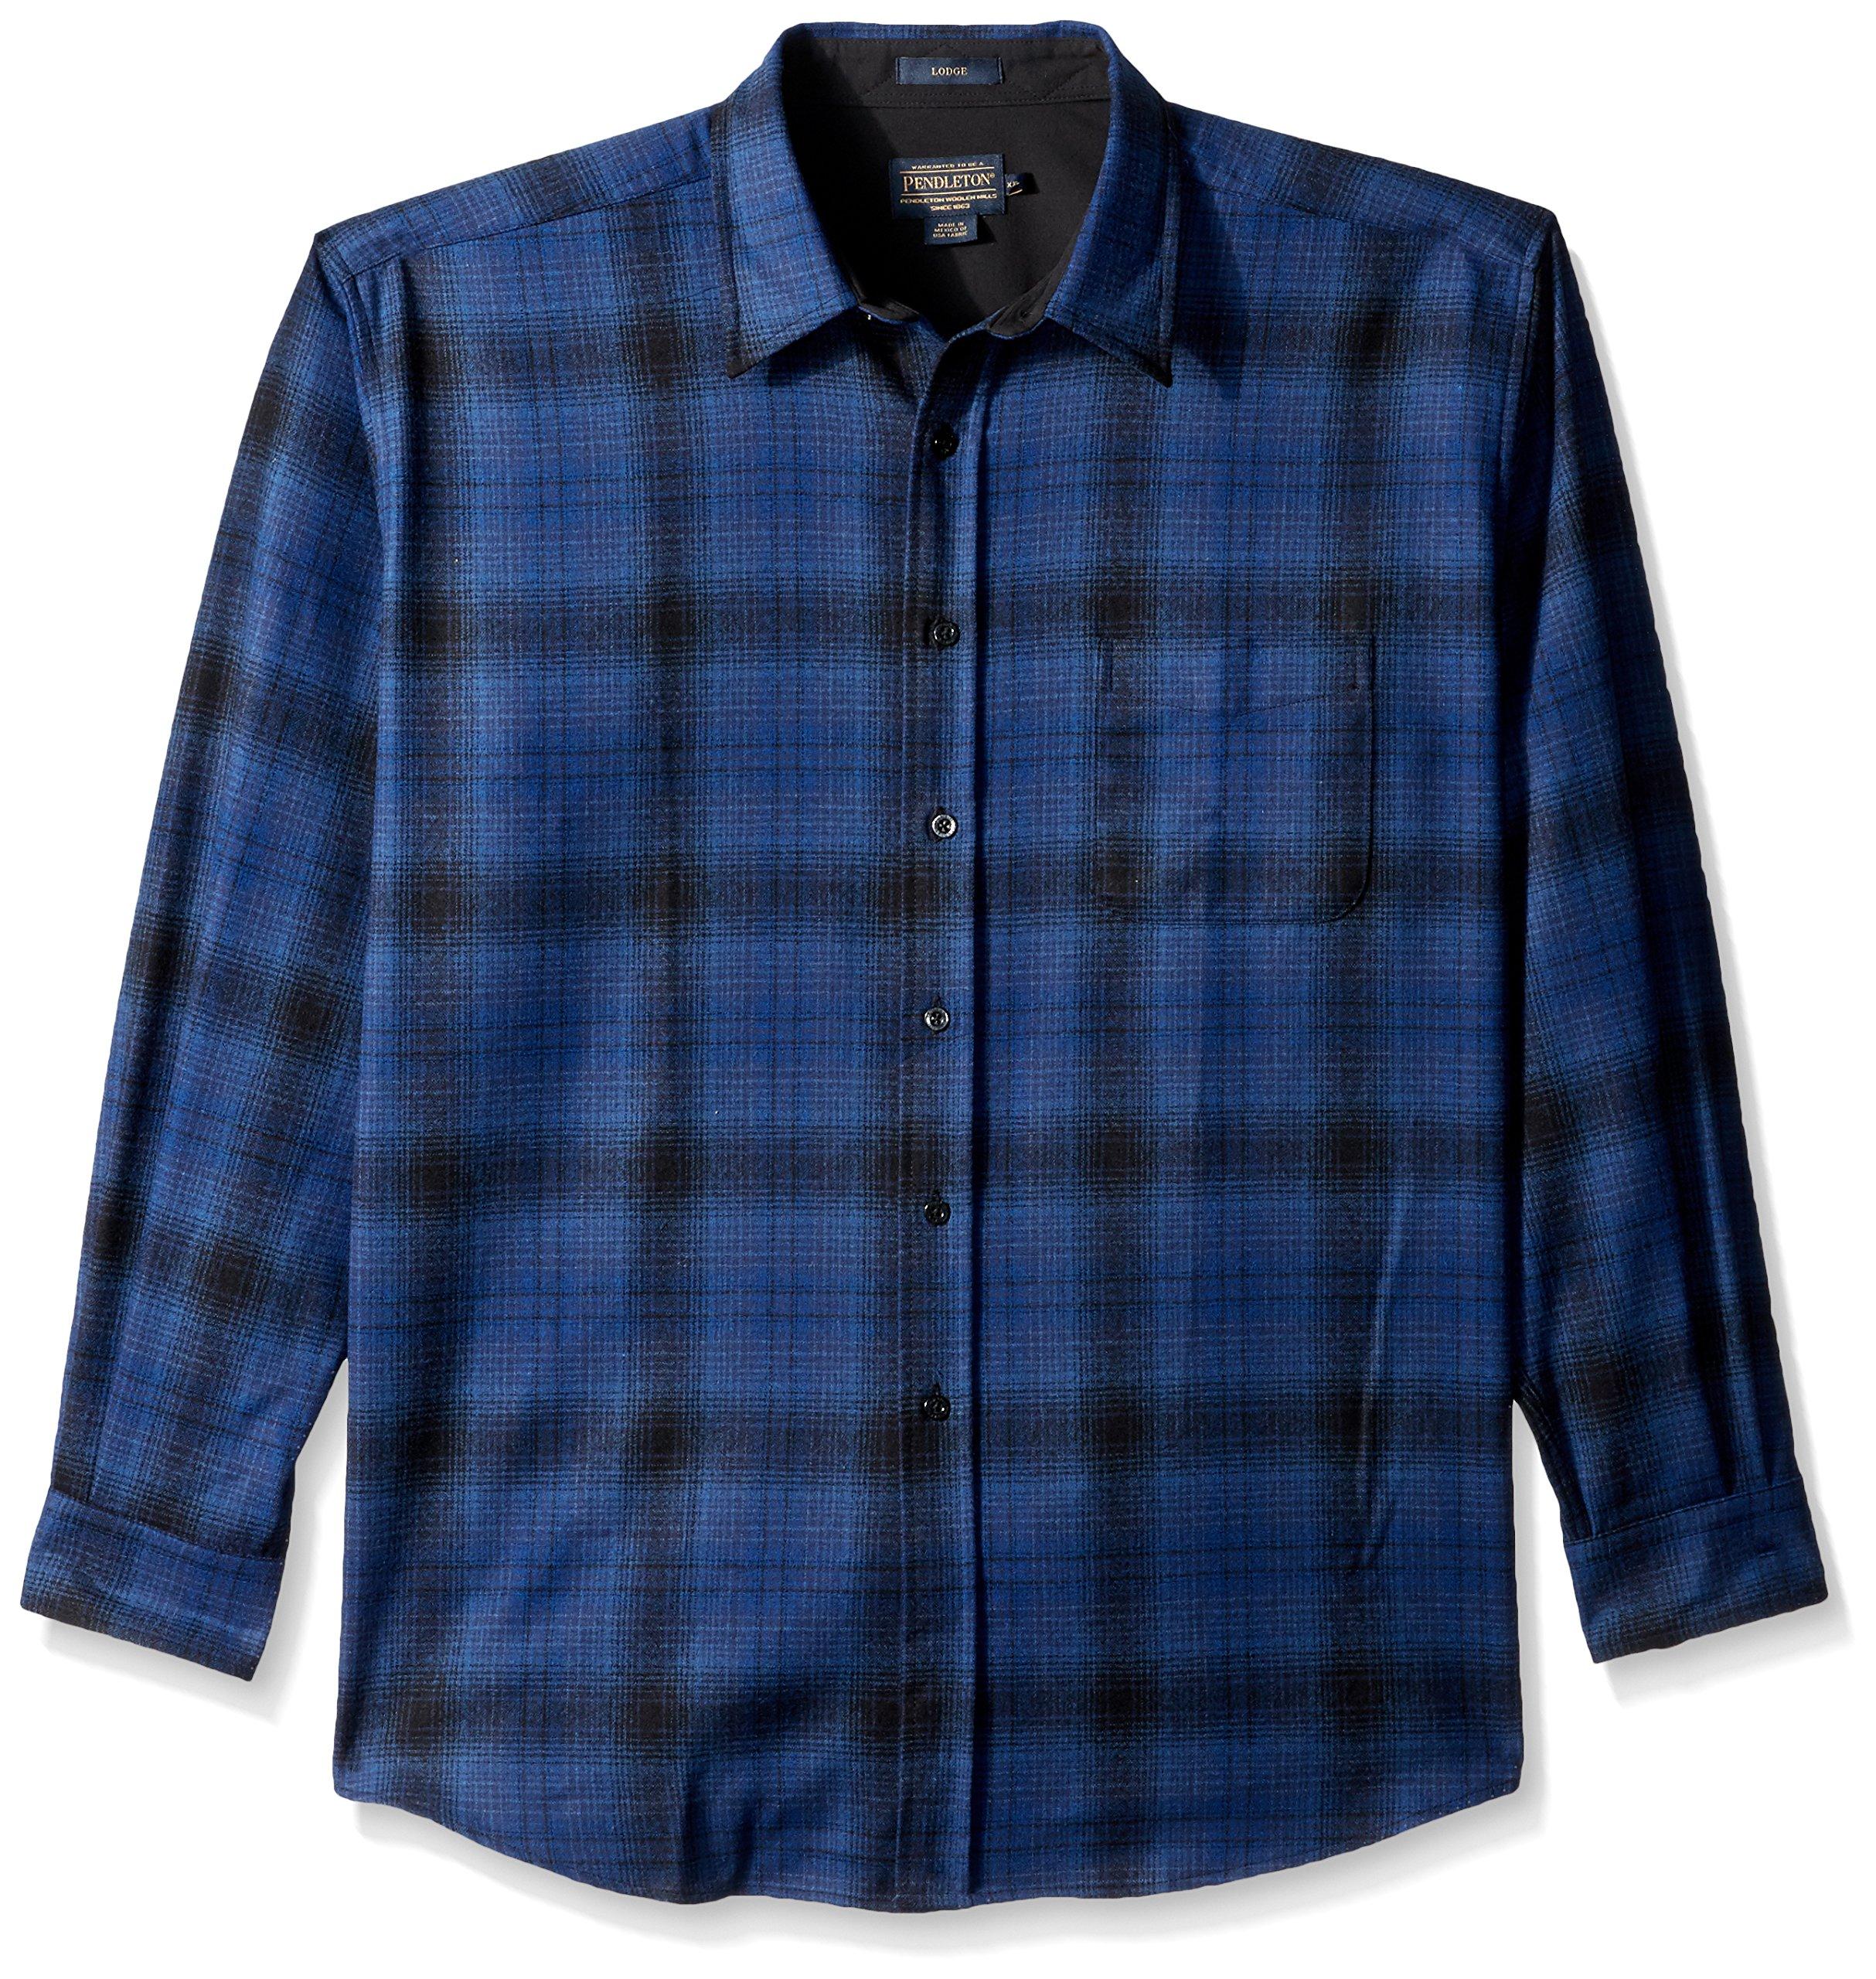 Pendleton Men's Long Sleeve Button Front Classic Lodge Shirt, Blue/Black Ombre-31951, LG